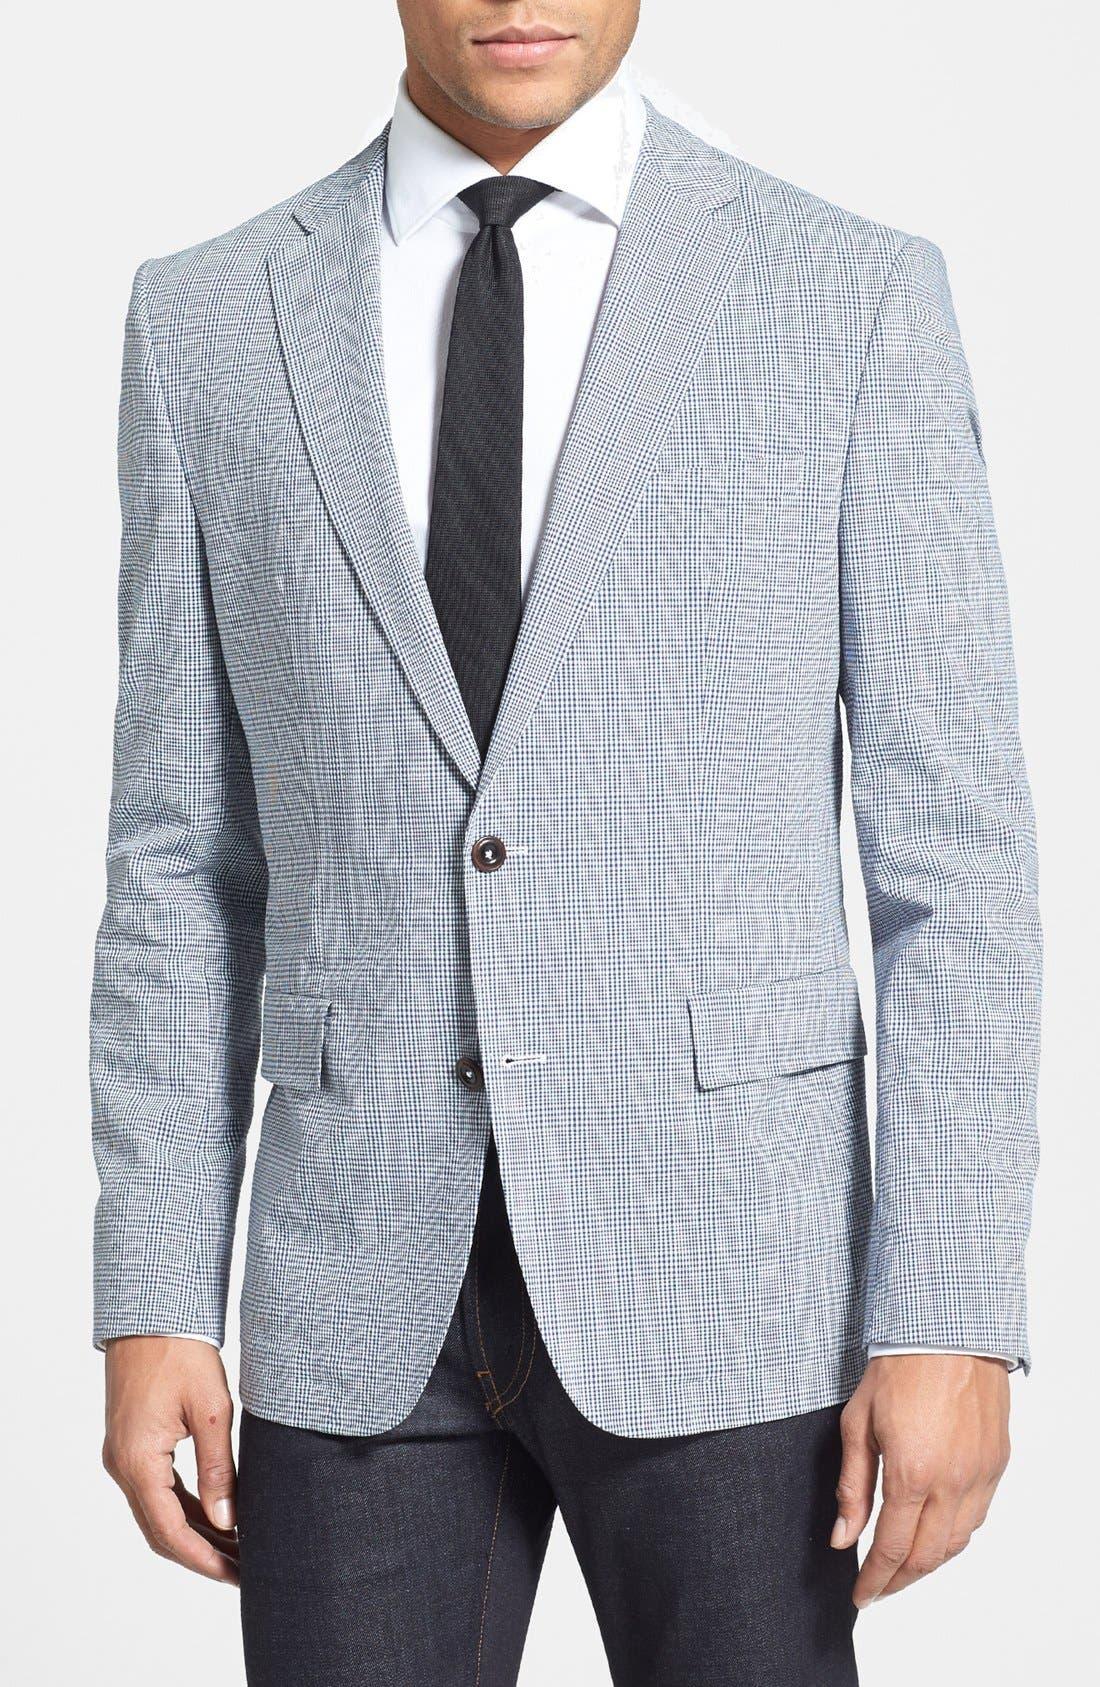 Main Image - BOSS HUGO BOSS 'Noris' Trim Fit Plaid Sportcoat